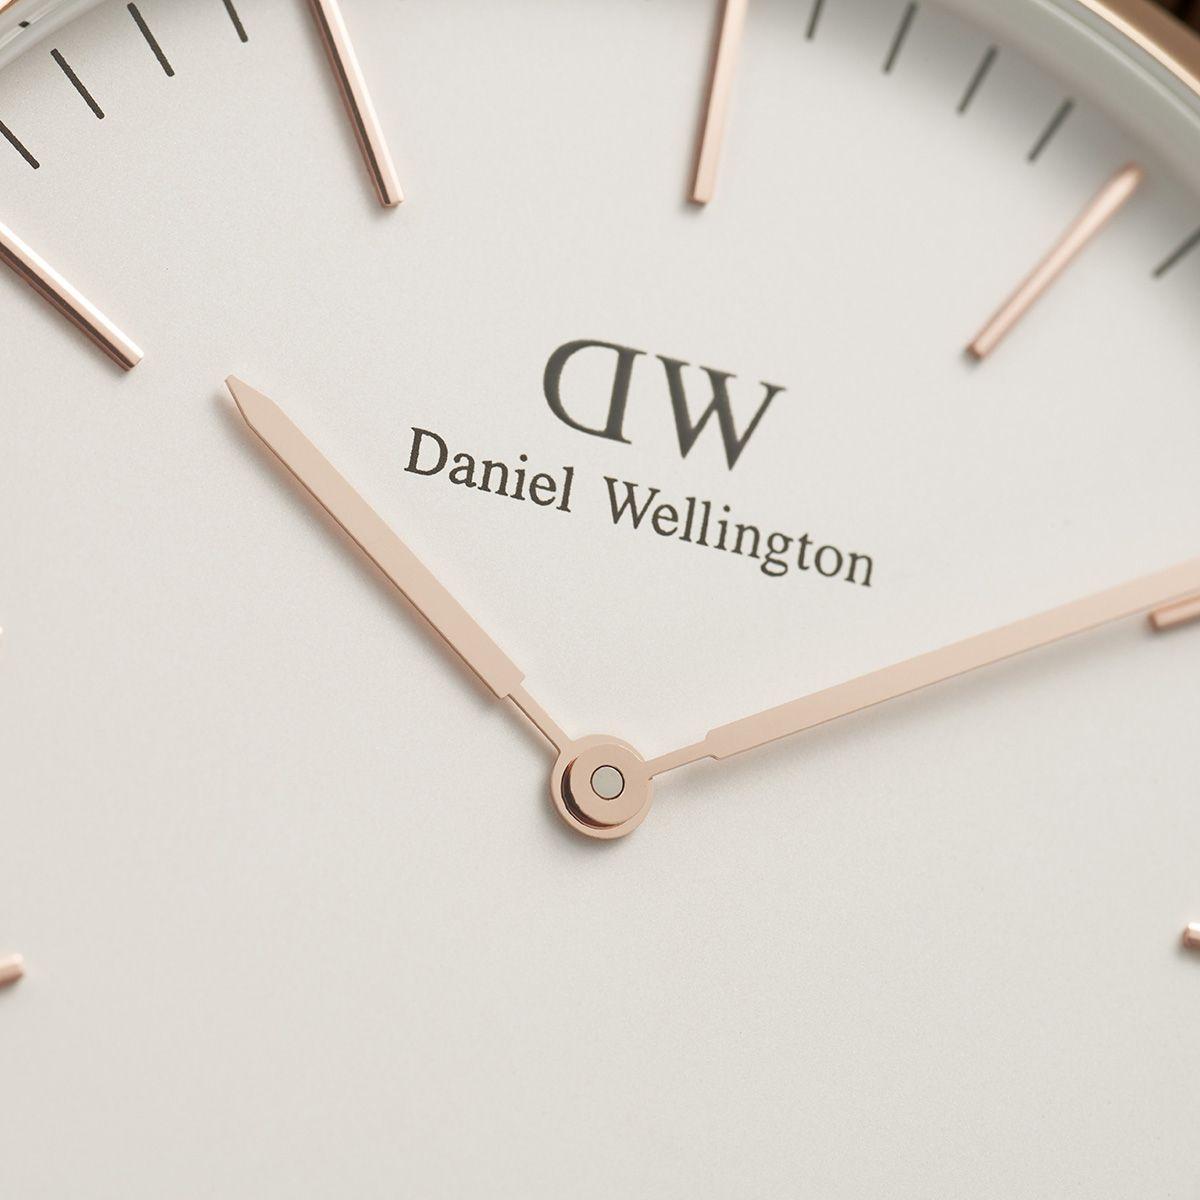 dw官网 dw手表官网 dw中国官网 dw官方旗舰店 DW DW官网  W Classic Bayswater RG 40mm